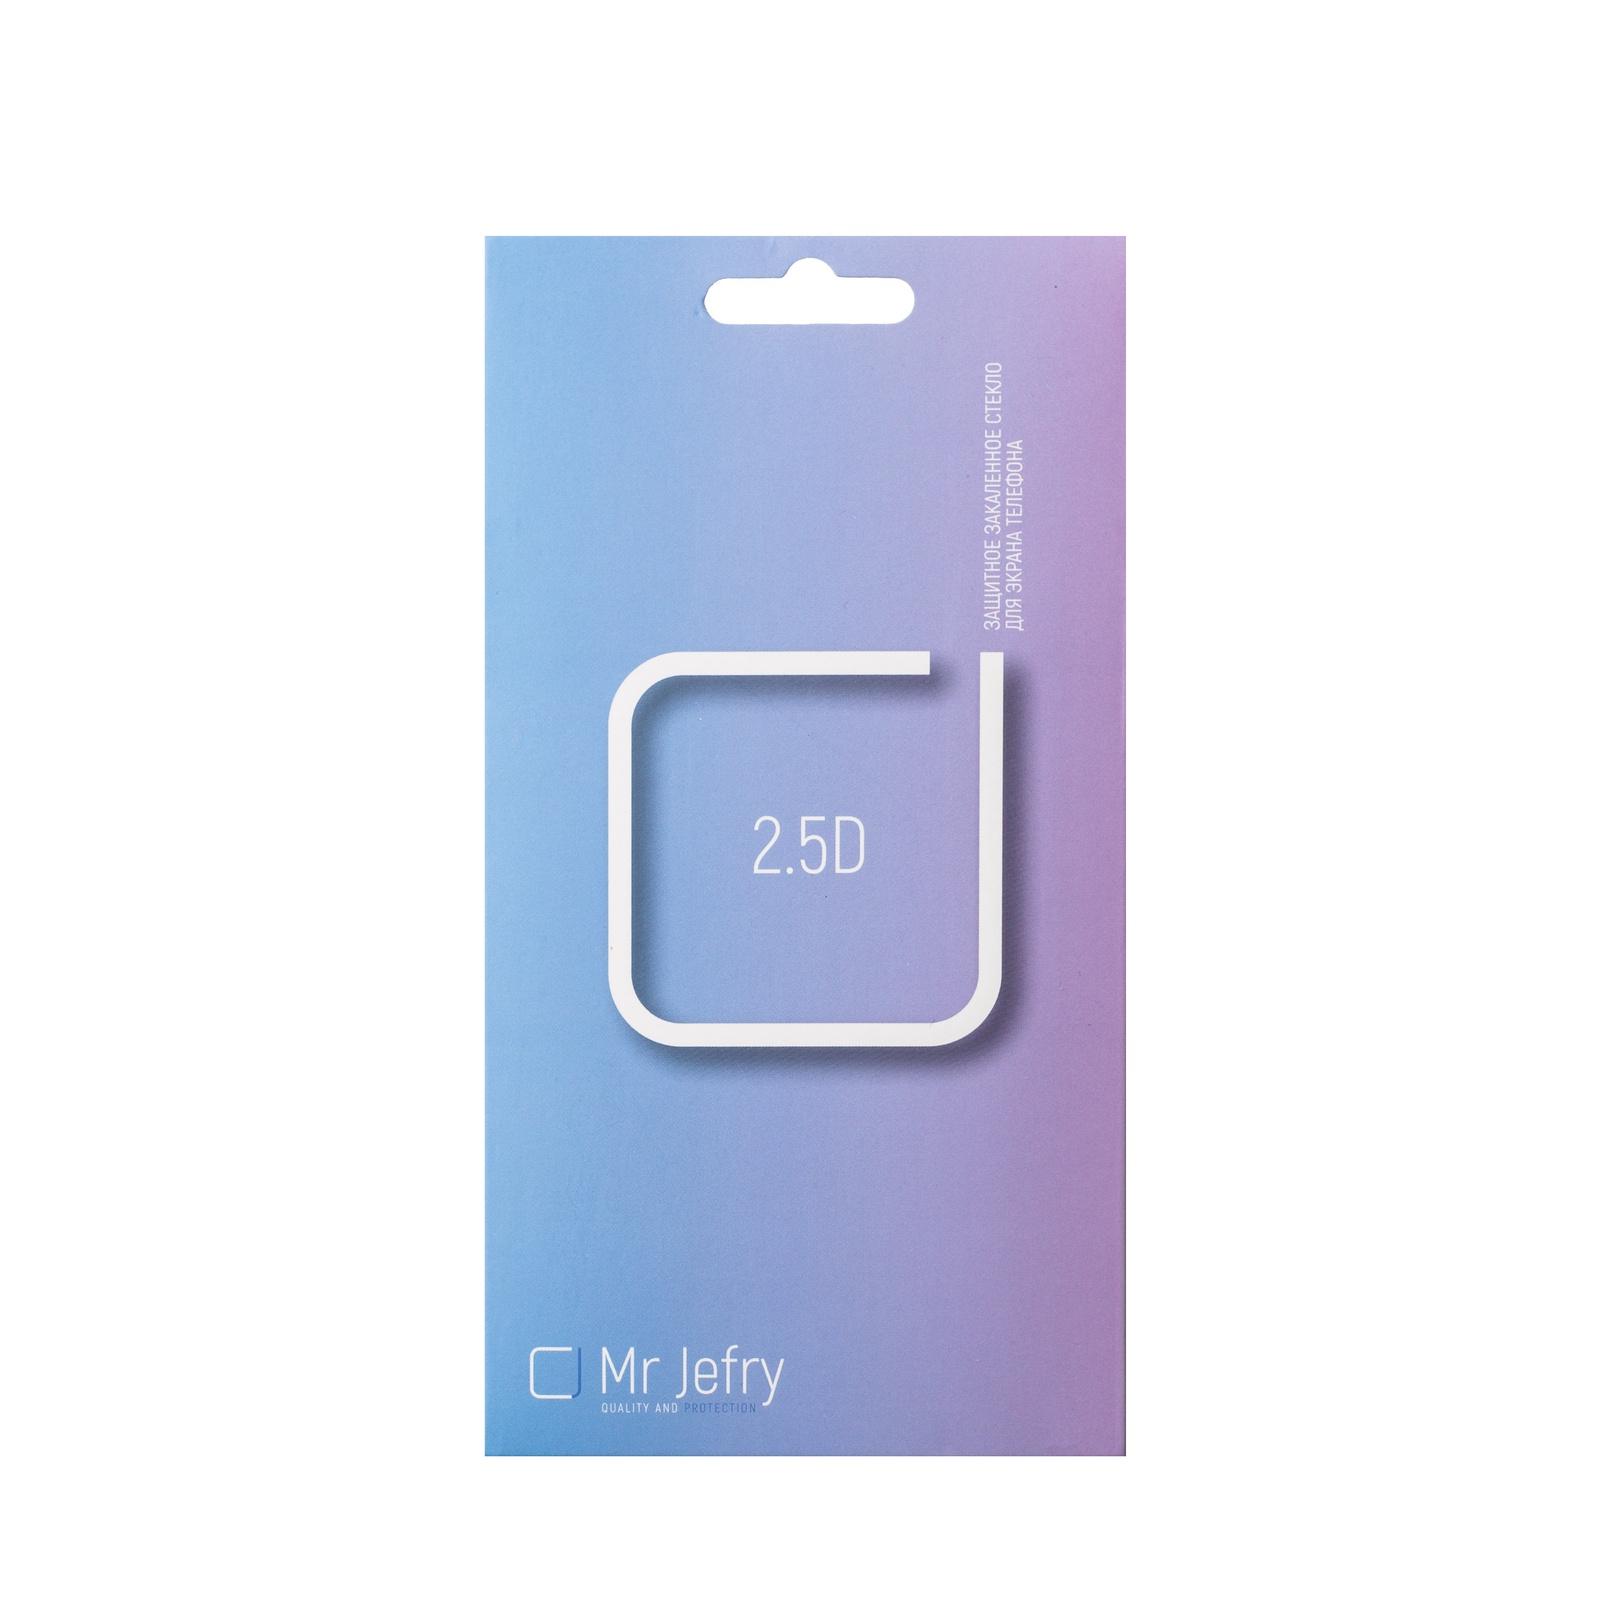 Mr Jefry стекло защитное (многослойное) 2,5D для Huawei Honor 8